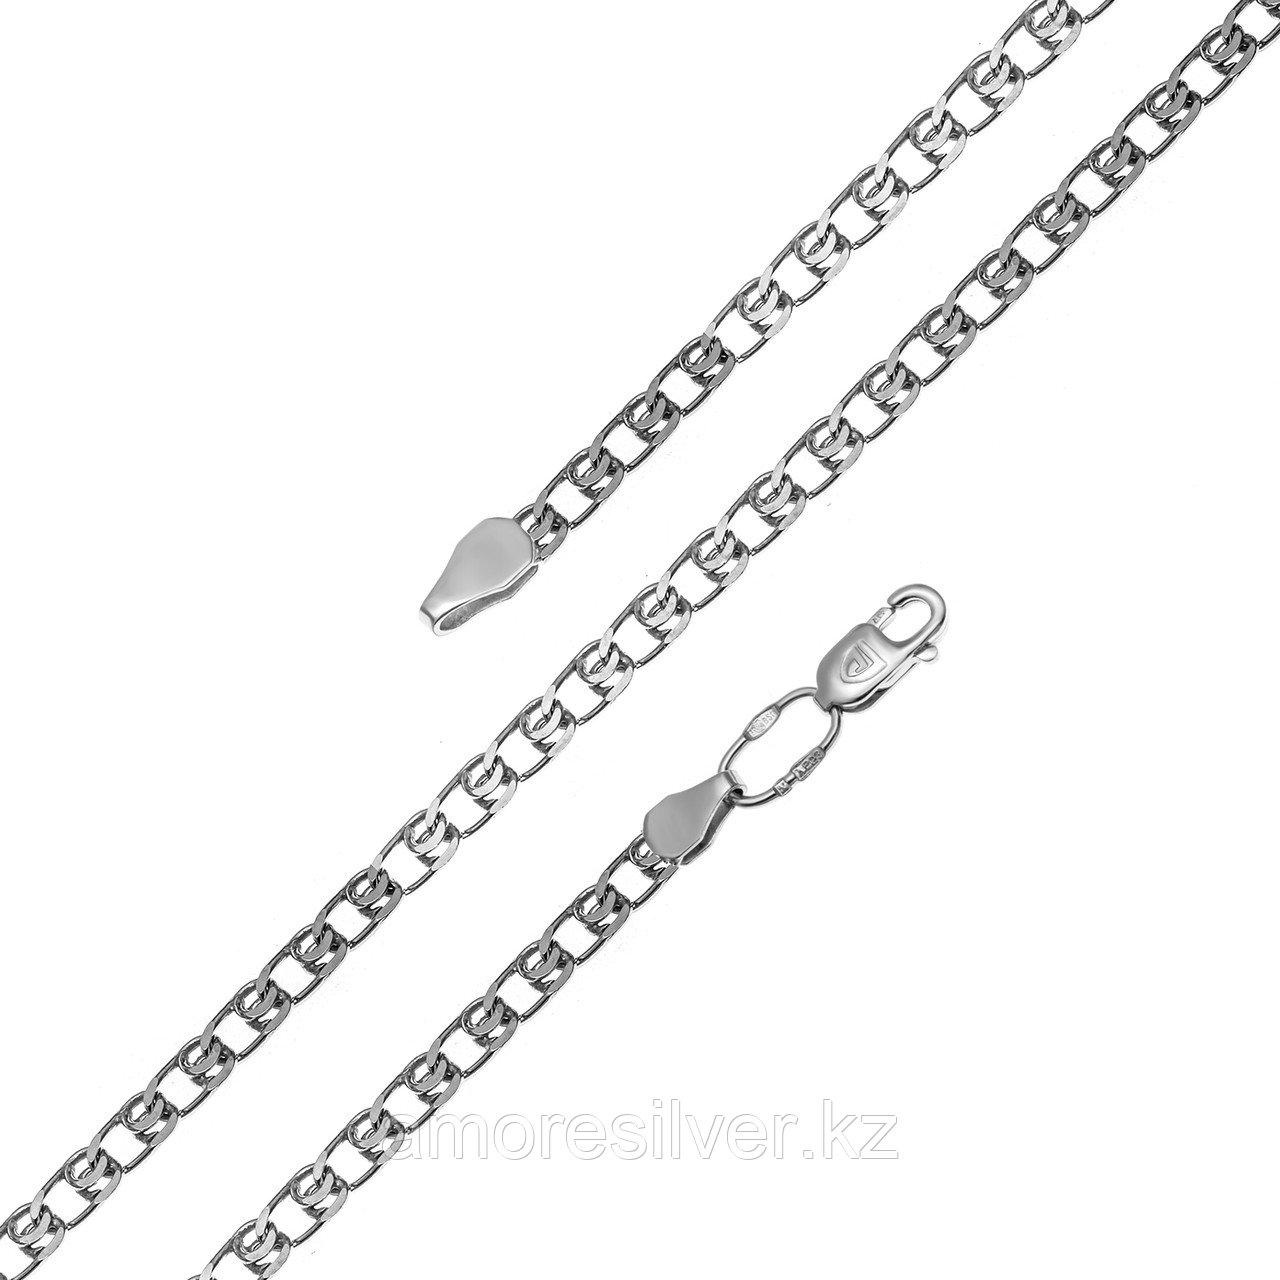 Цепь  серебро с родием, без вставок, лав 81050190160